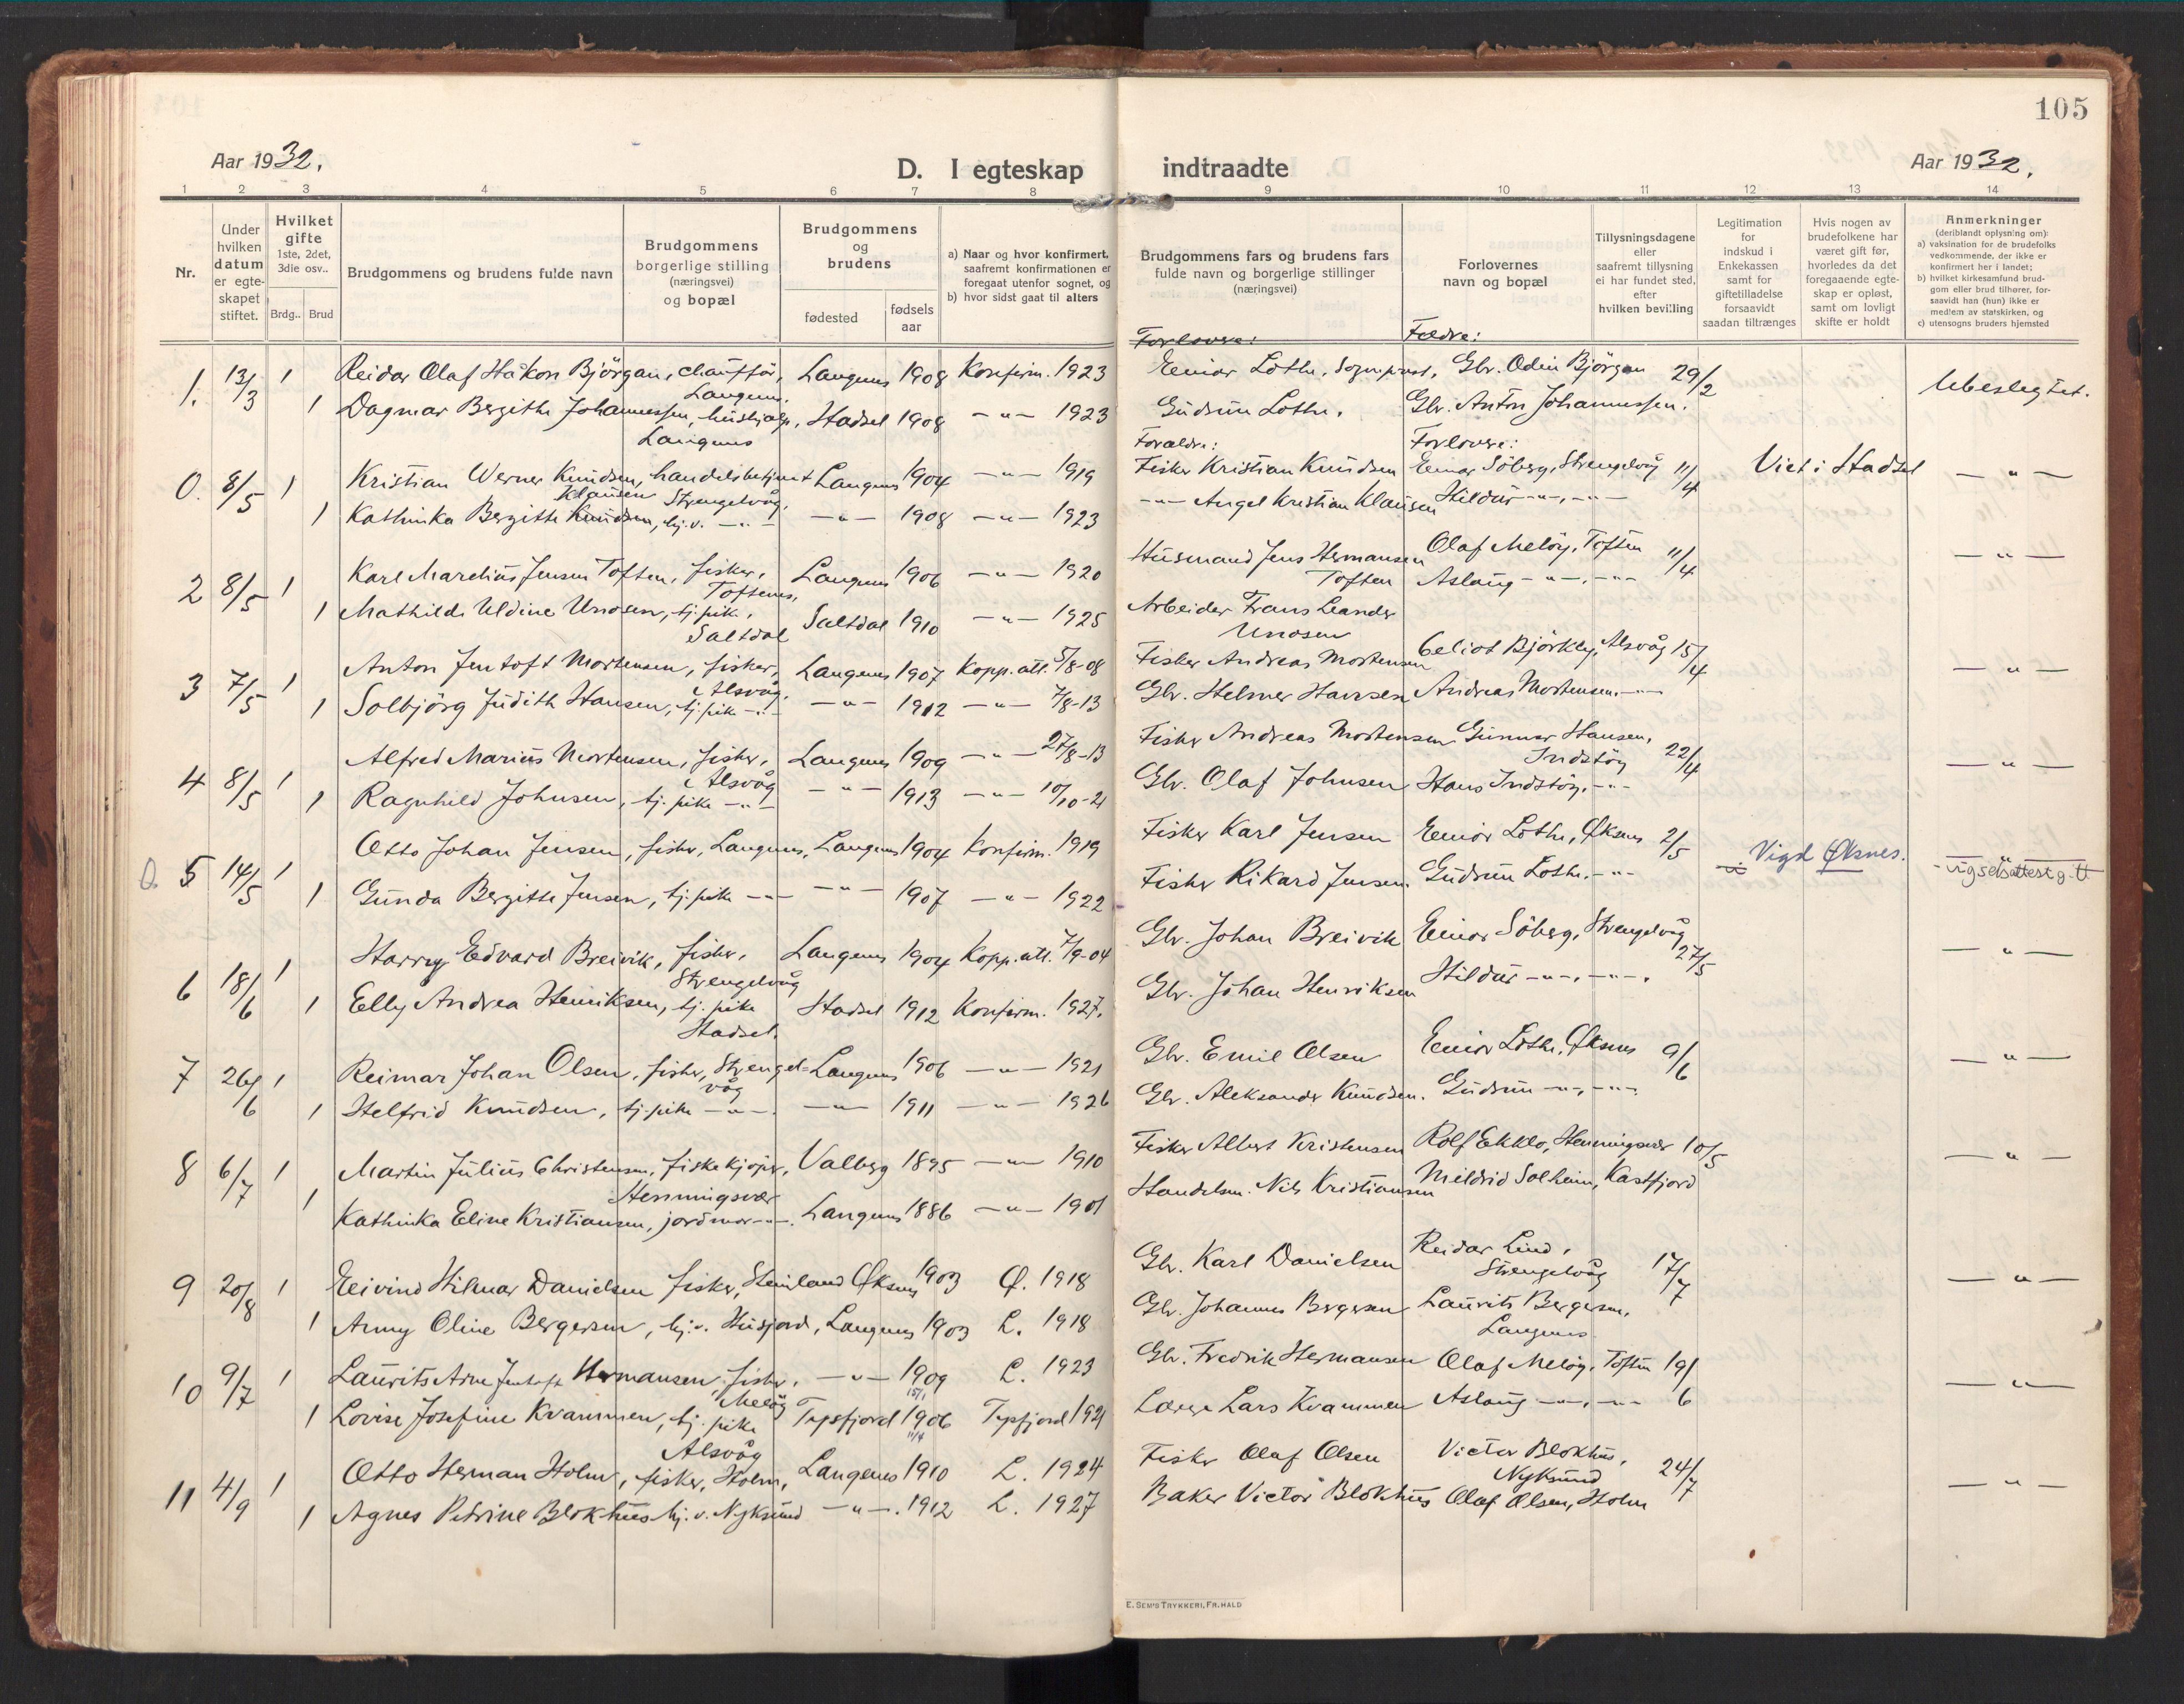 SAT, Ministerialprotokoller, klokkerbøker og fødselsregistre - Nordland, 894/L1357: Ministerialbok nr. 894A03, 1913-1934, s. 105